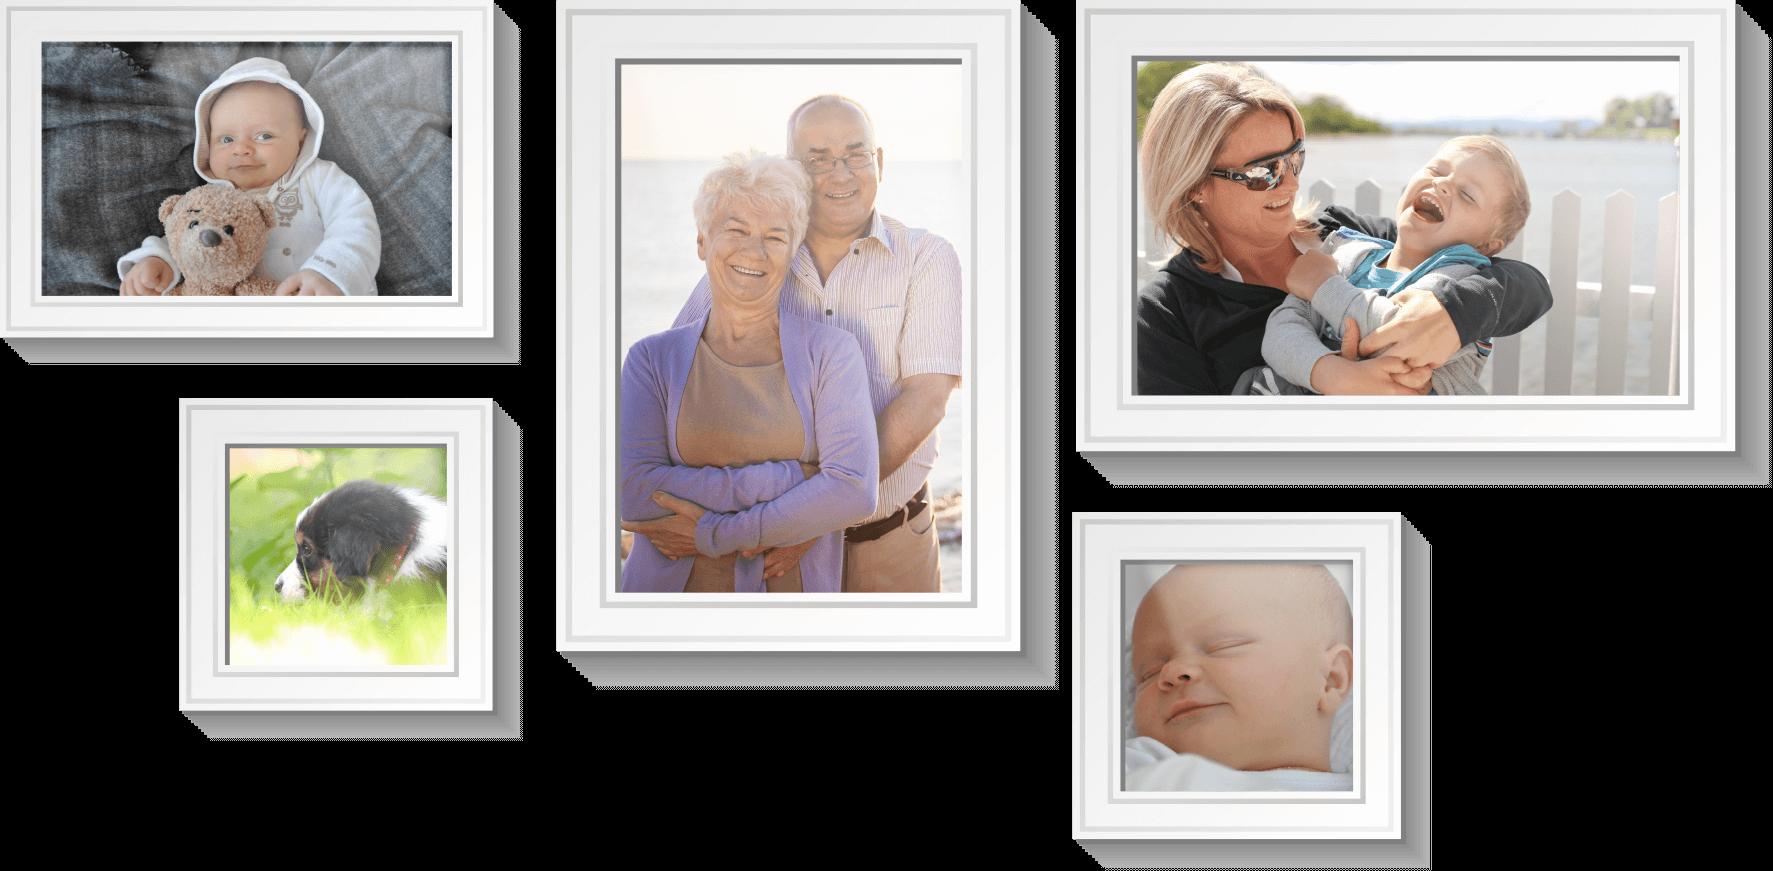 Rodinné fotografie na zdi